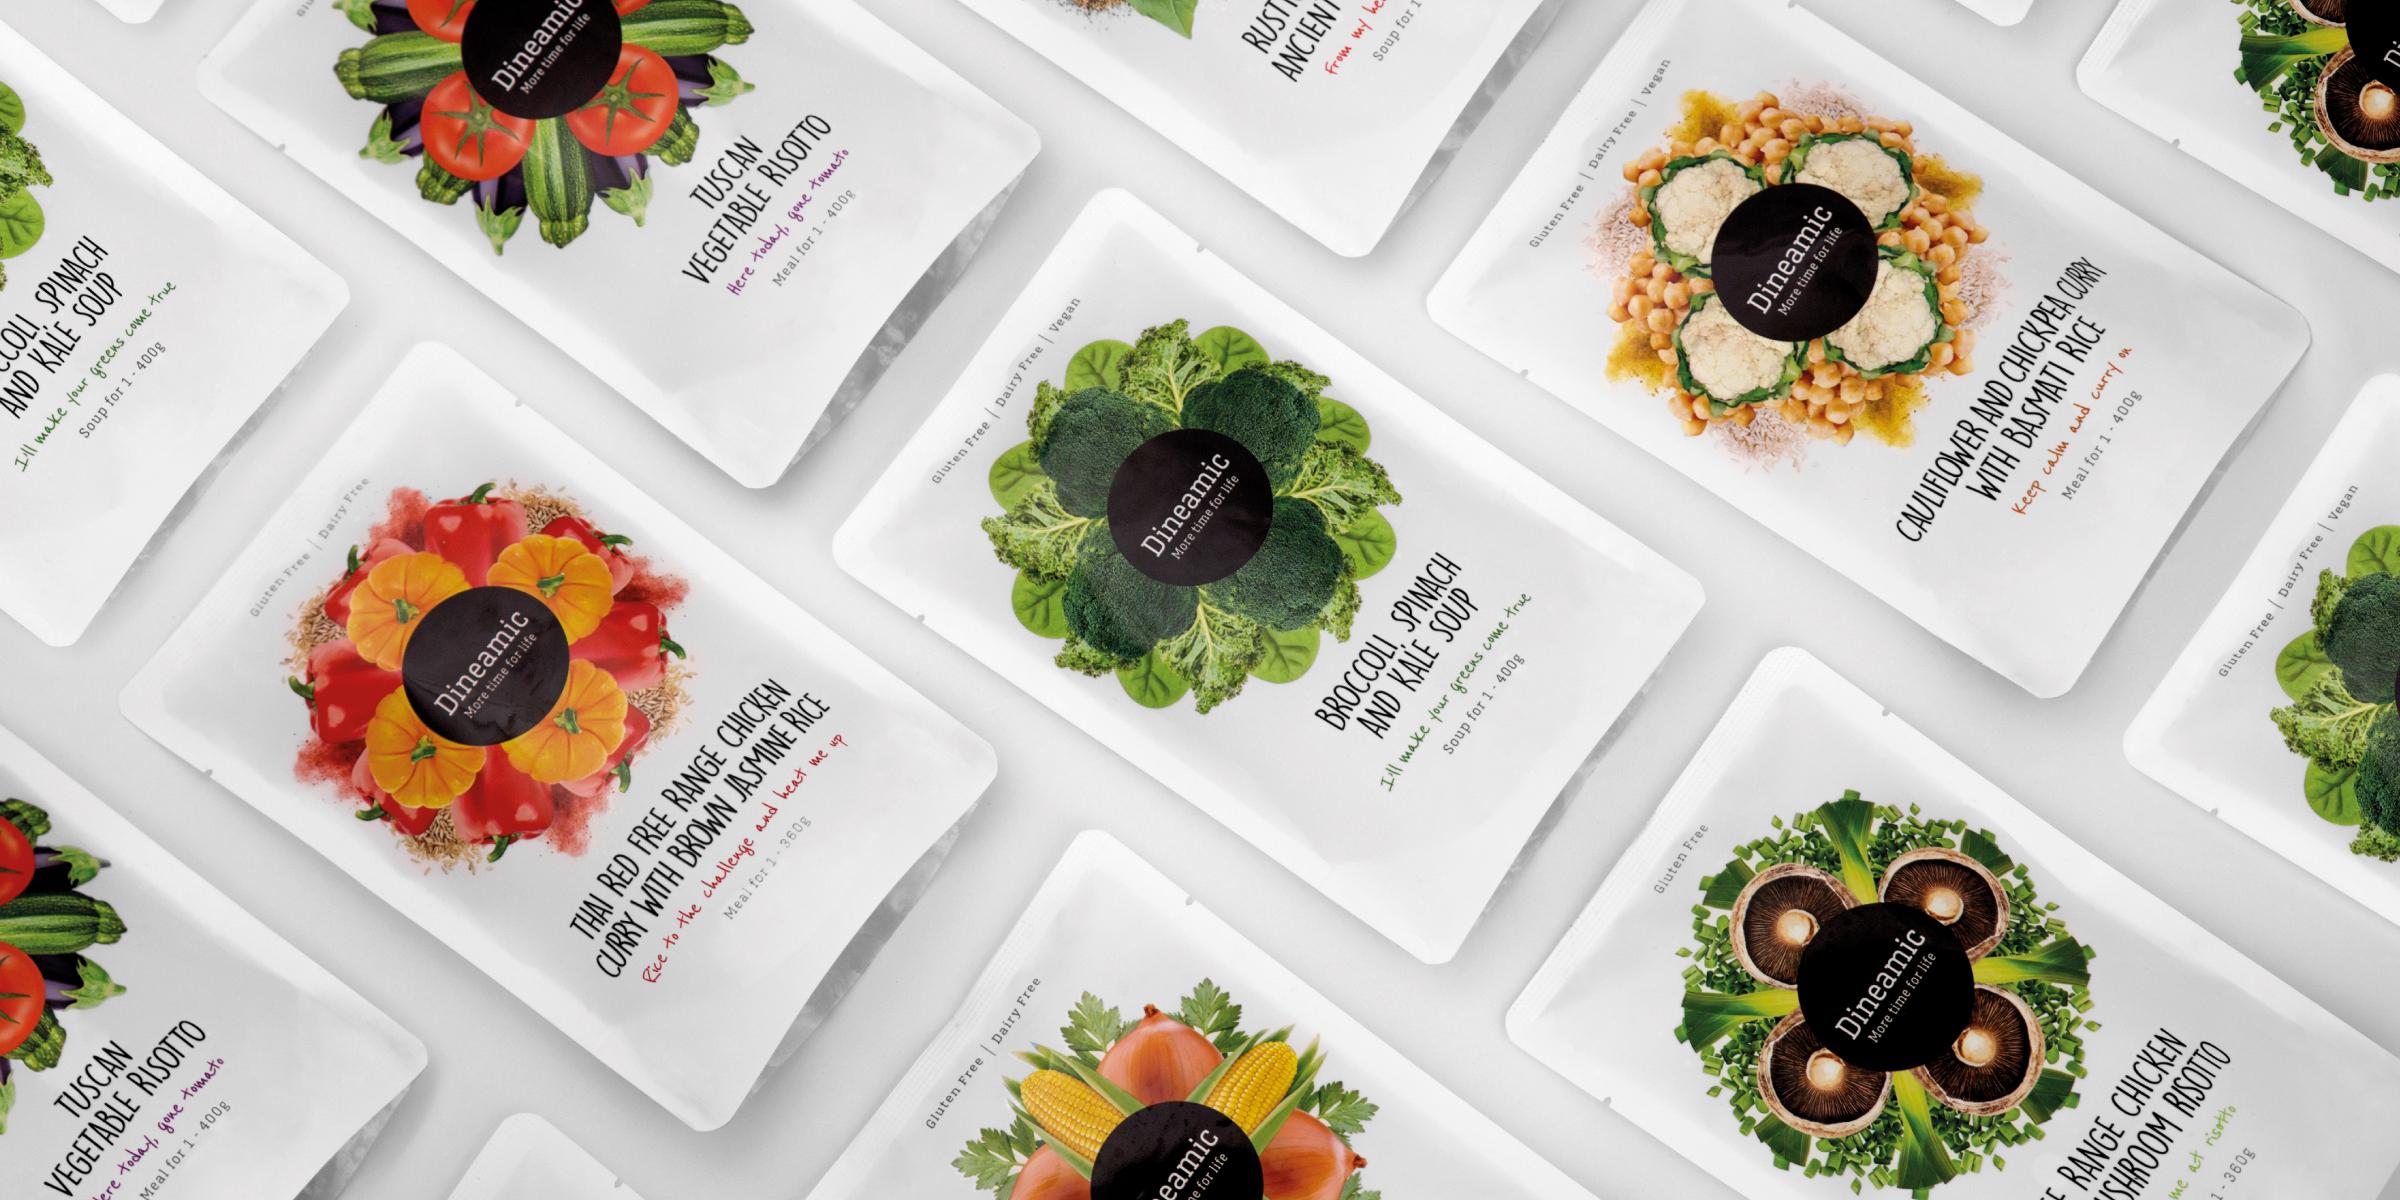 Davidson Branding FMCG Dineamic Packaging Range Flat Lay